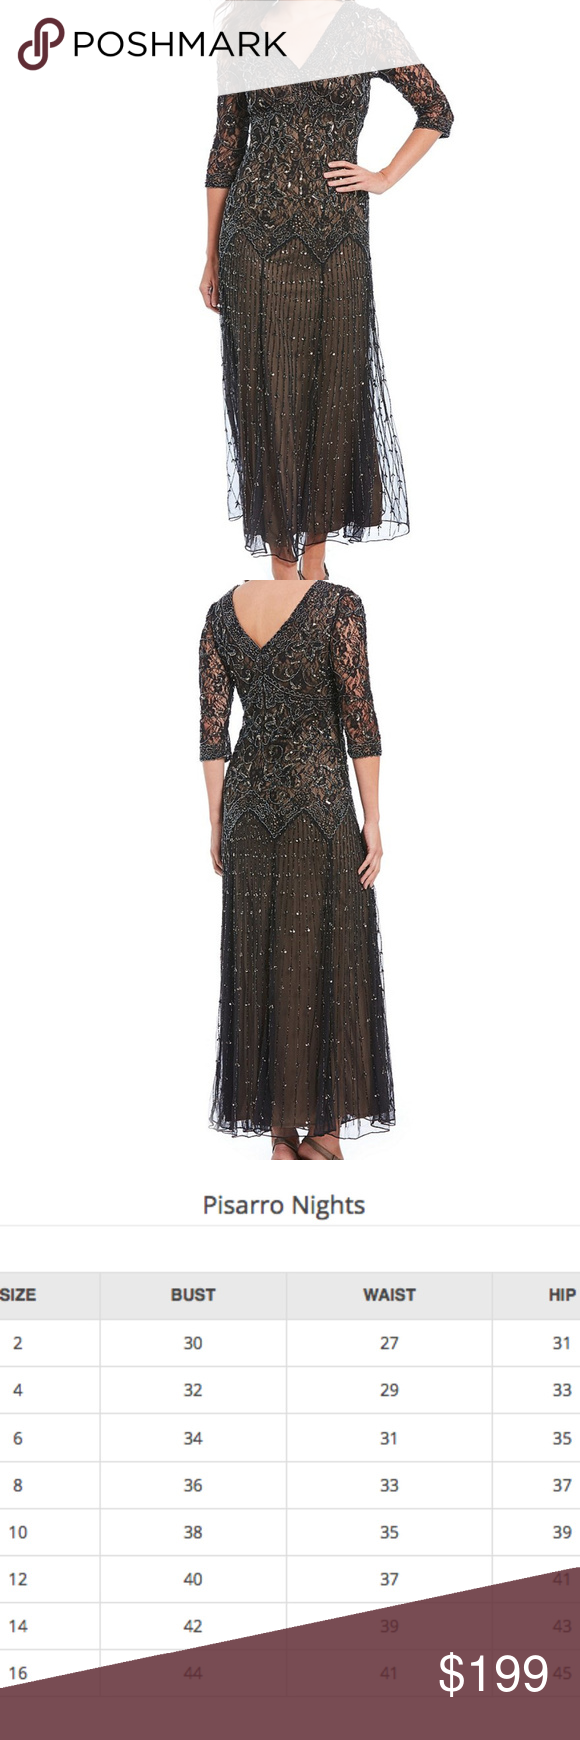 NWOT Pisarro Nights Beaded V-Neck gown dress | My Posh Closet ...